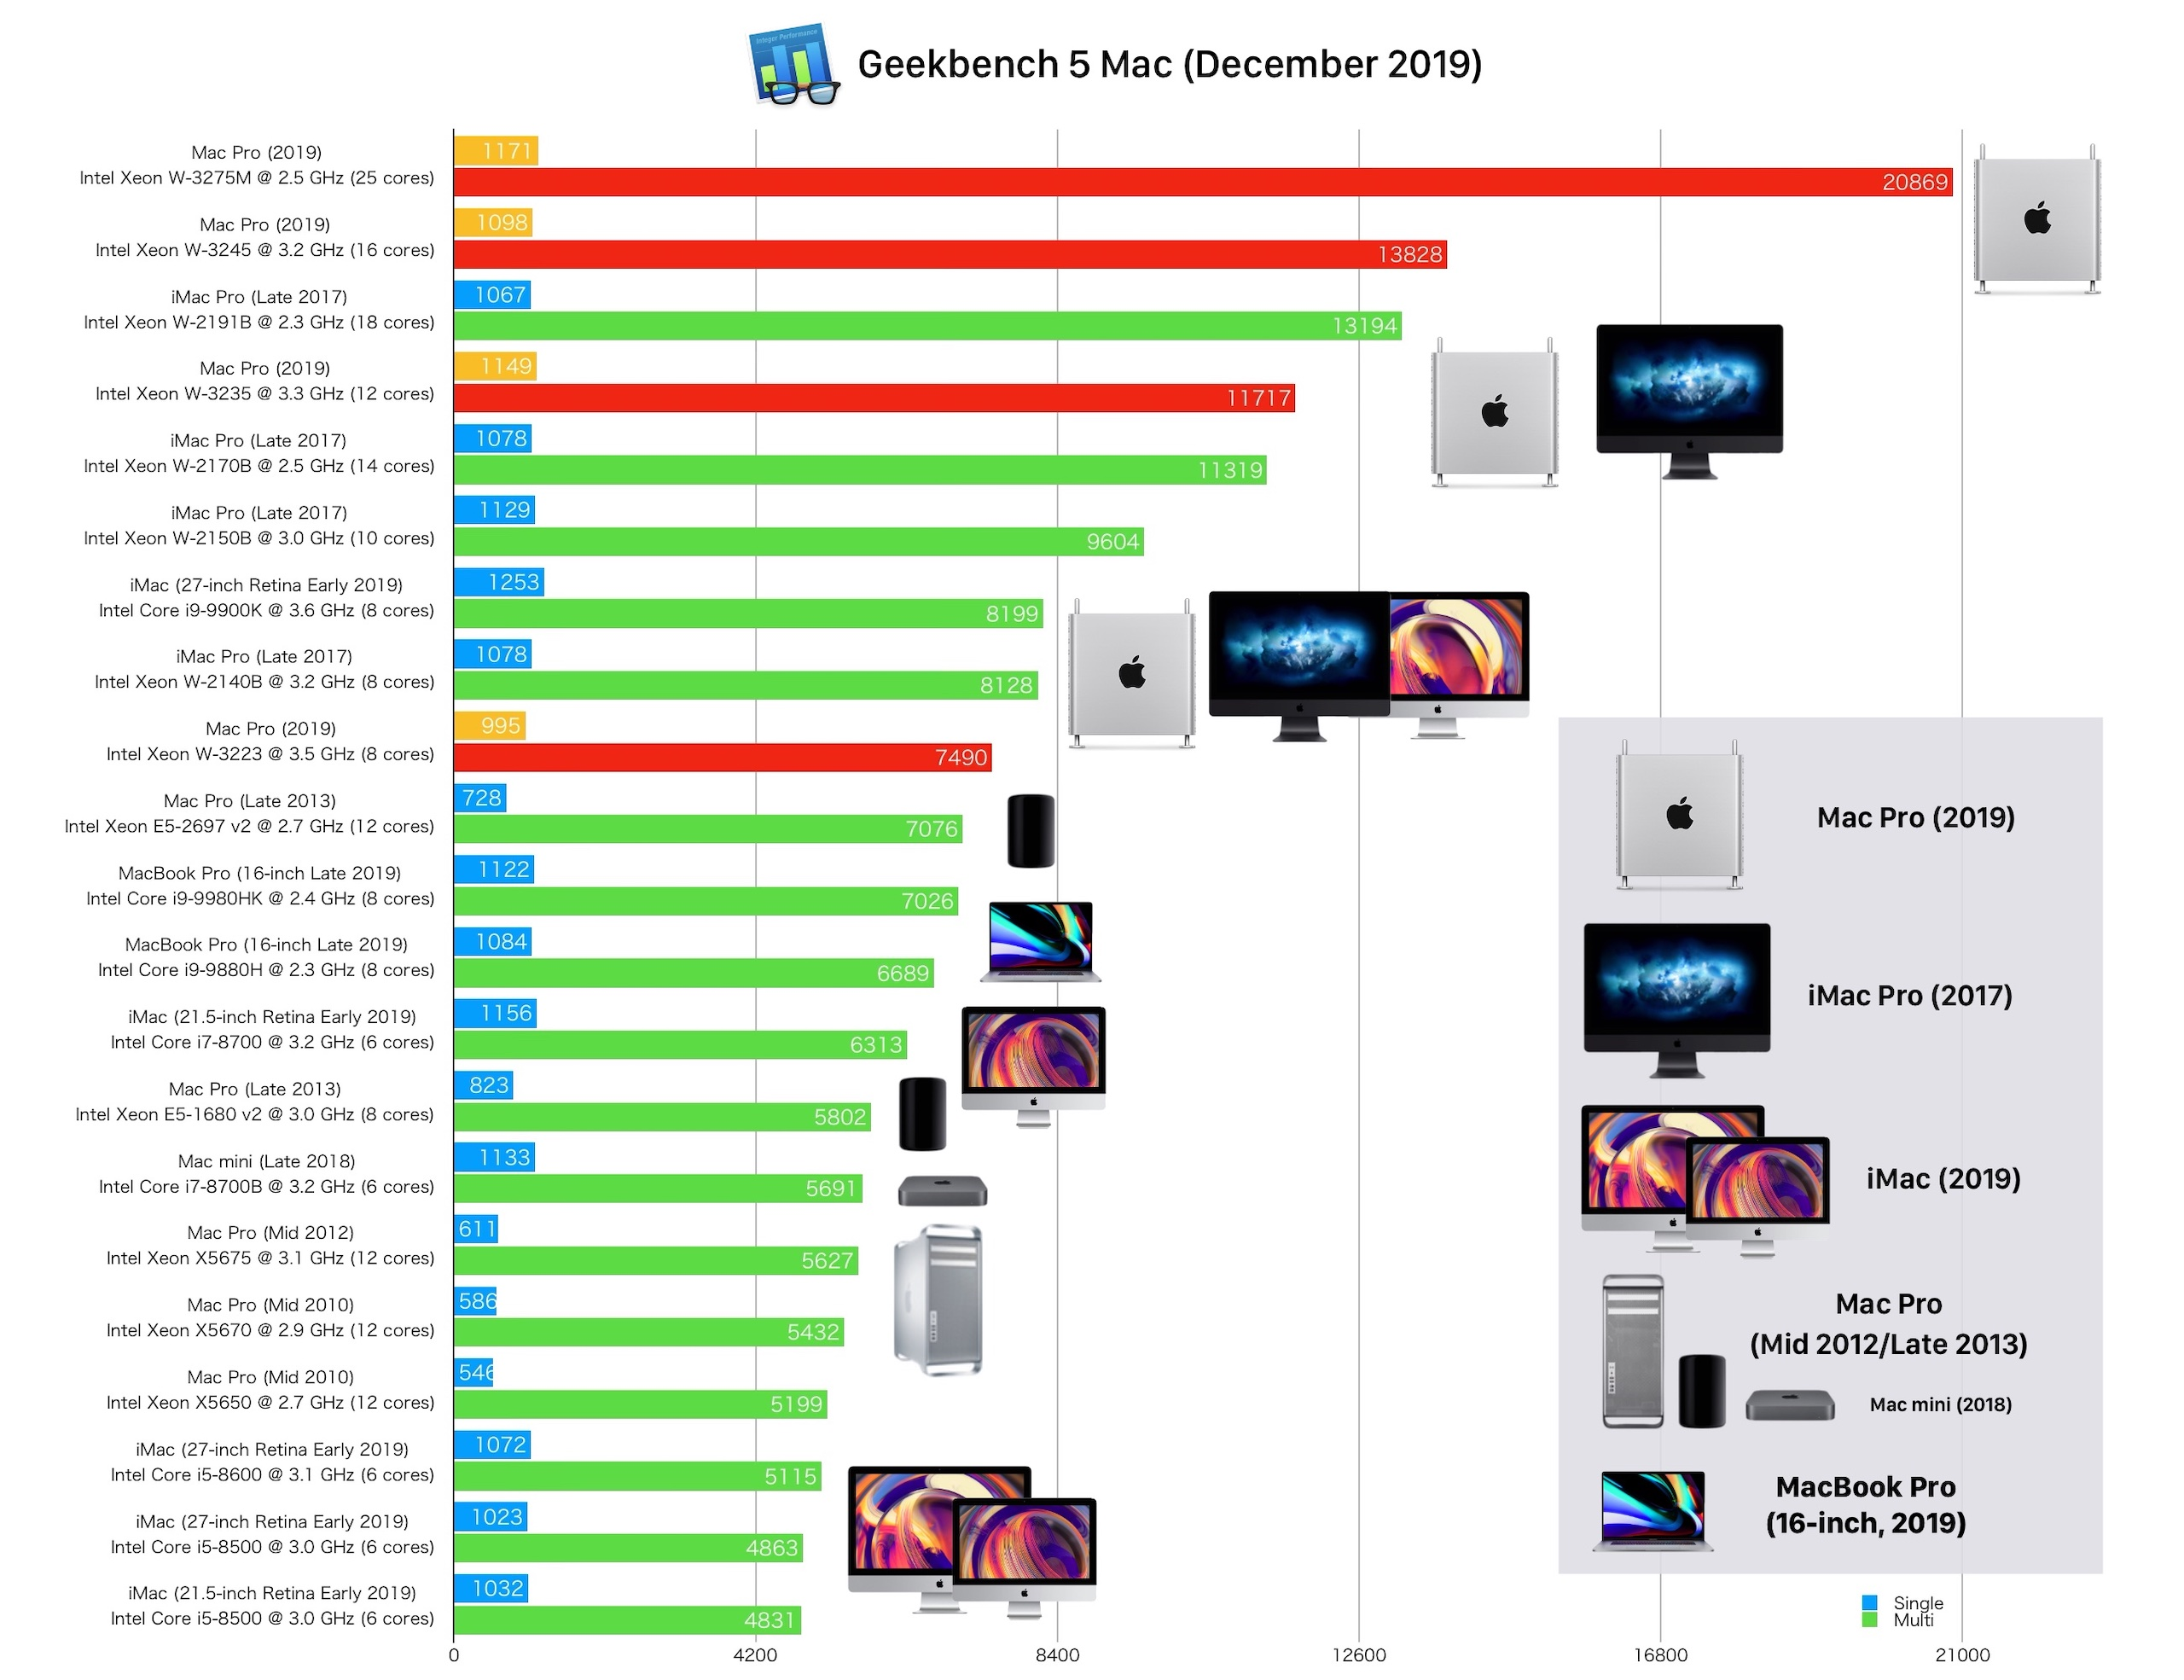 Mac Pro (2019)のGeekbench 5 CPUベンチマーク